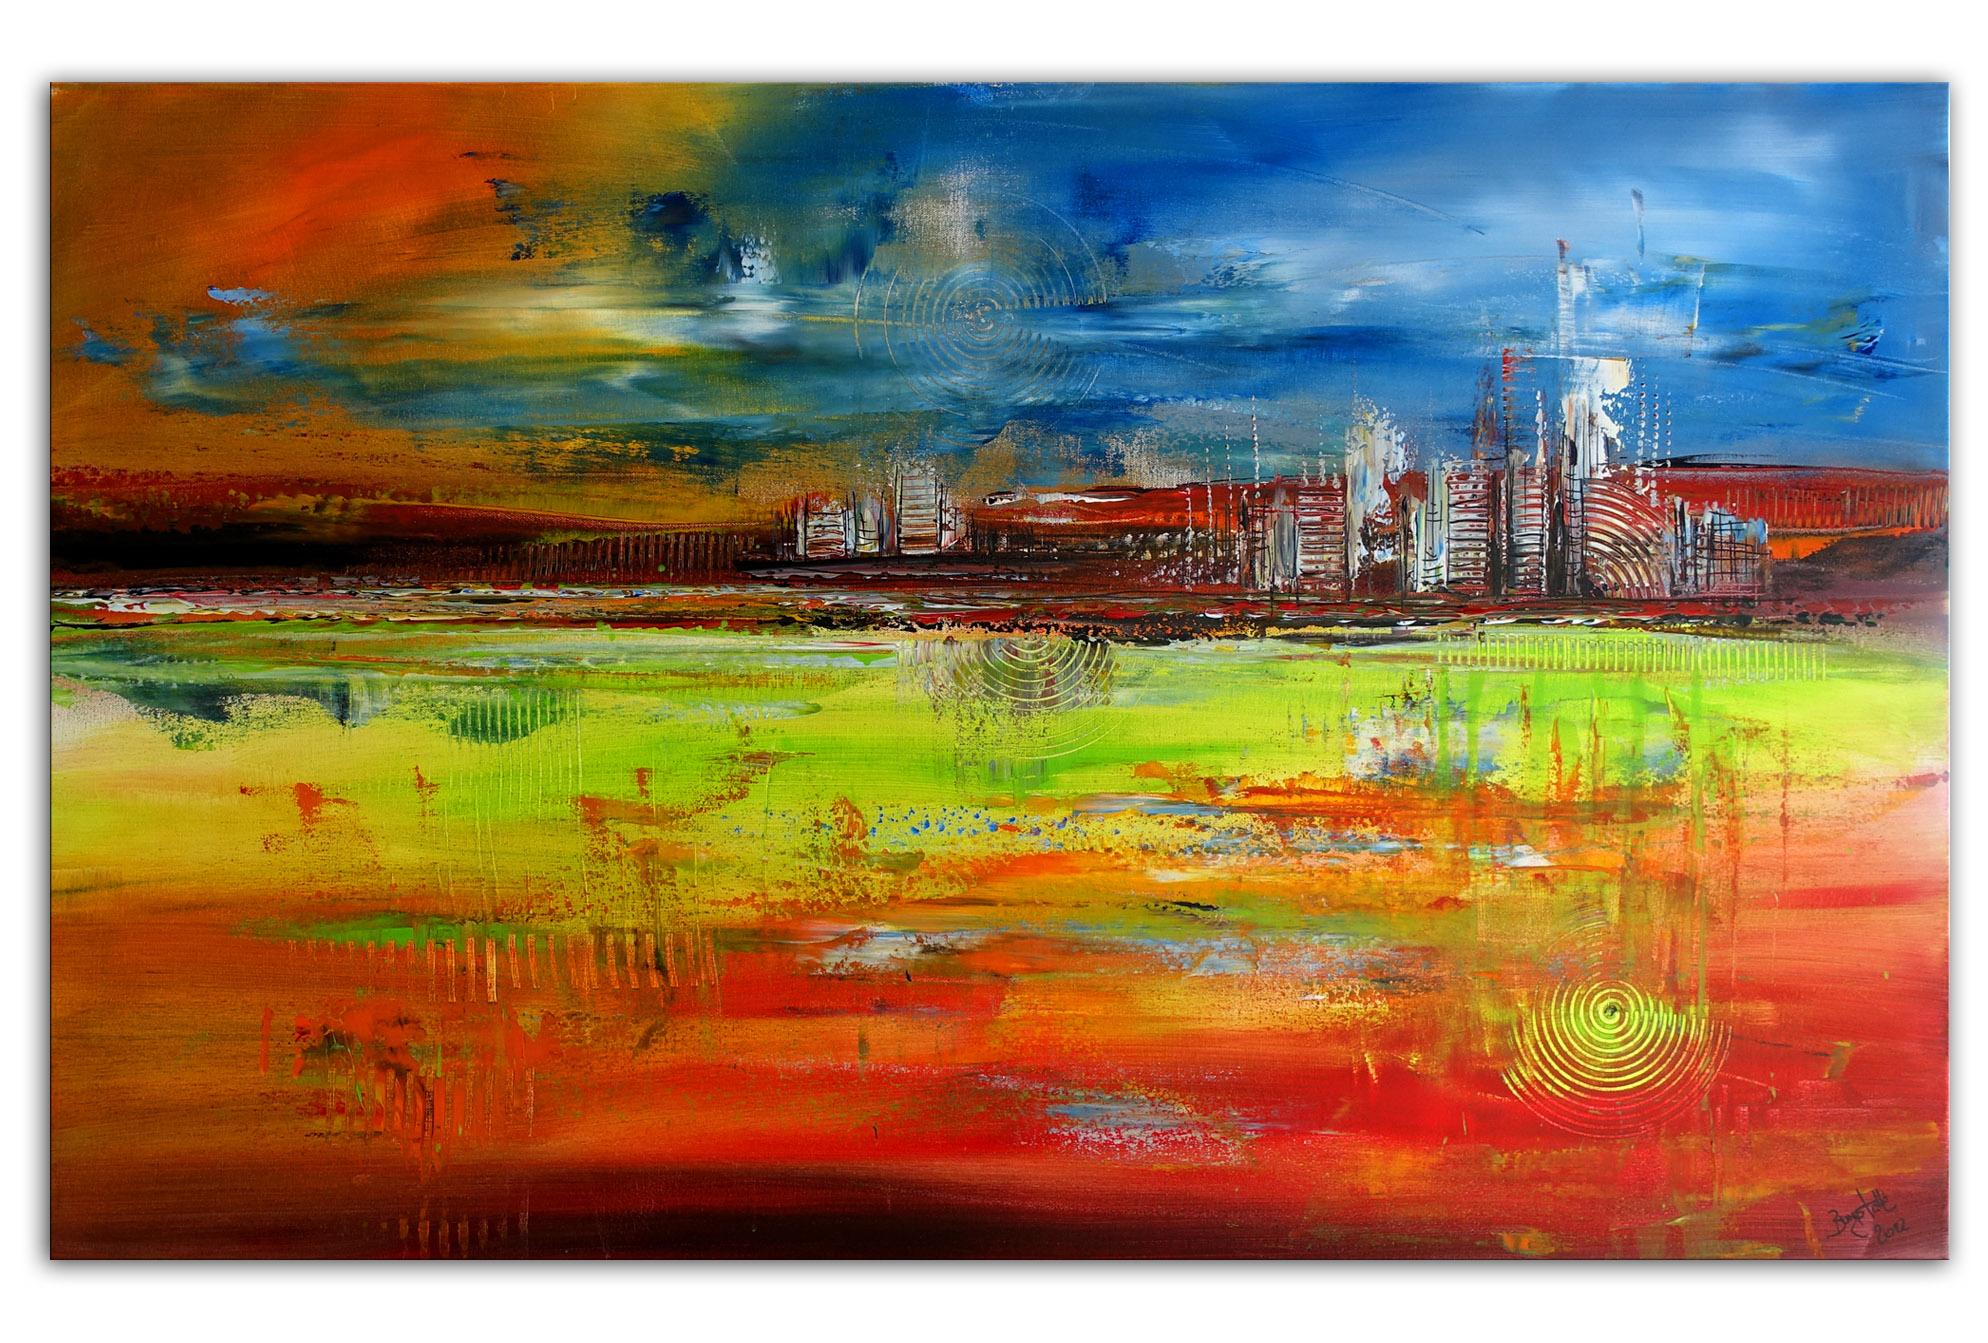 Höhlengeister Fluid Painting abstrakte Kunst Bilder gemalt kaufen 80x100